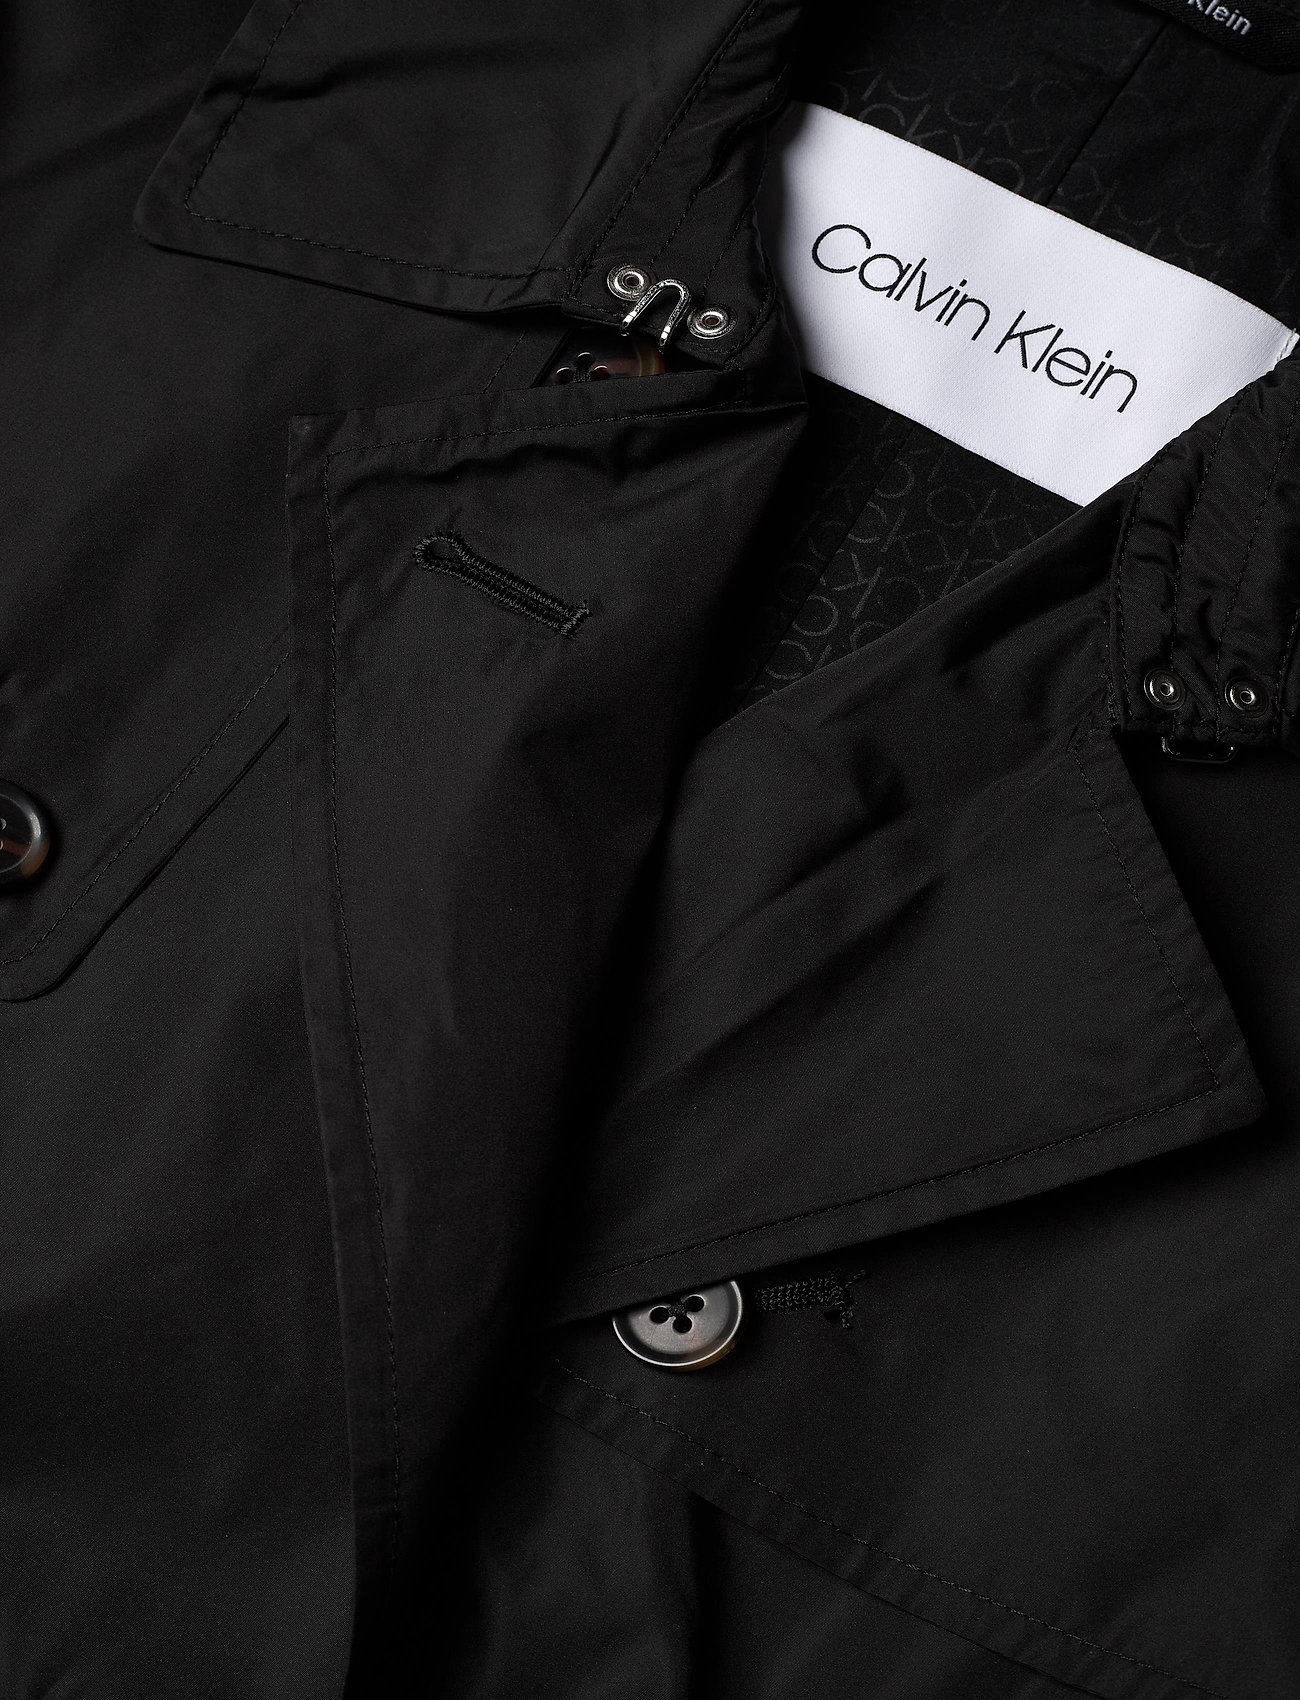 Lightweight Nylon Trench (Ck Black) (2800 kr) - Calvin Klein